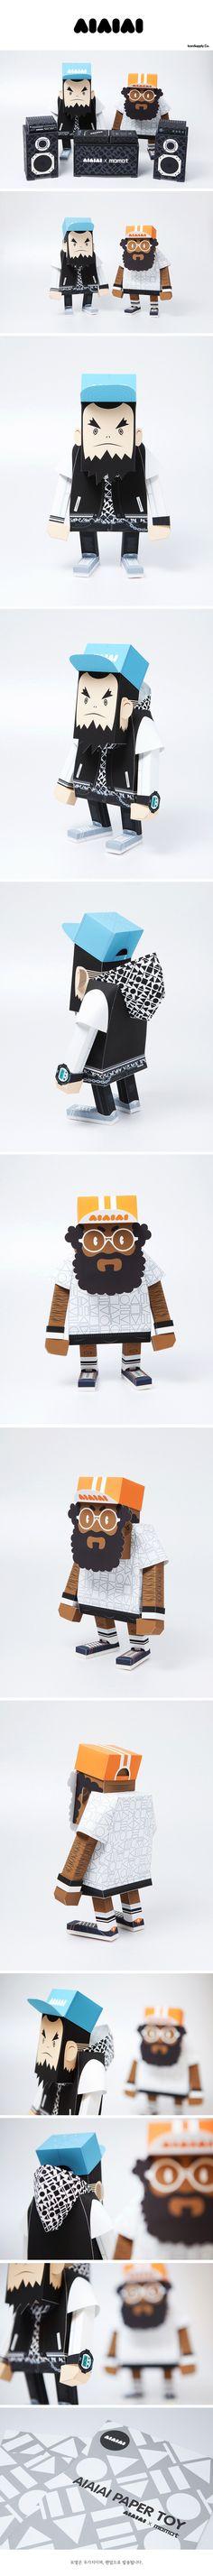 aiaiai | momot paper toys